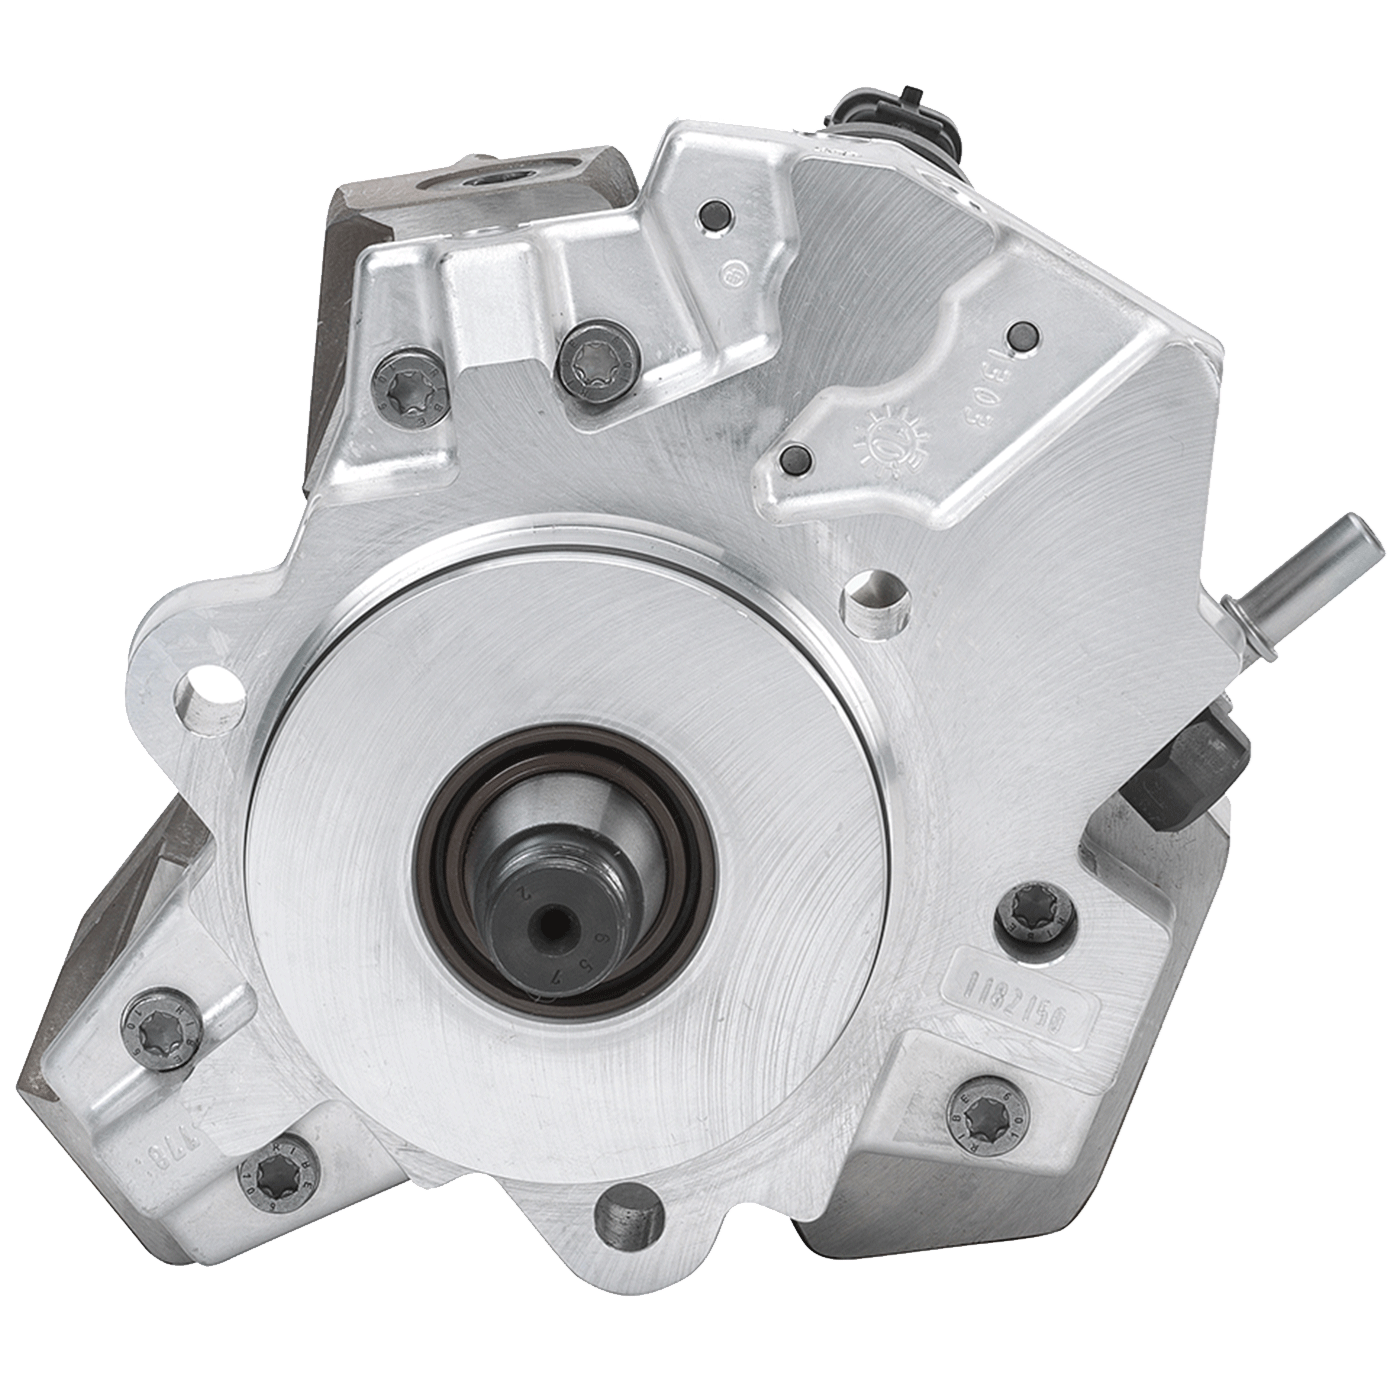 0986437308 - Bosch CP3 Common Rail Fuel Pump - GM 2004-05 LLY